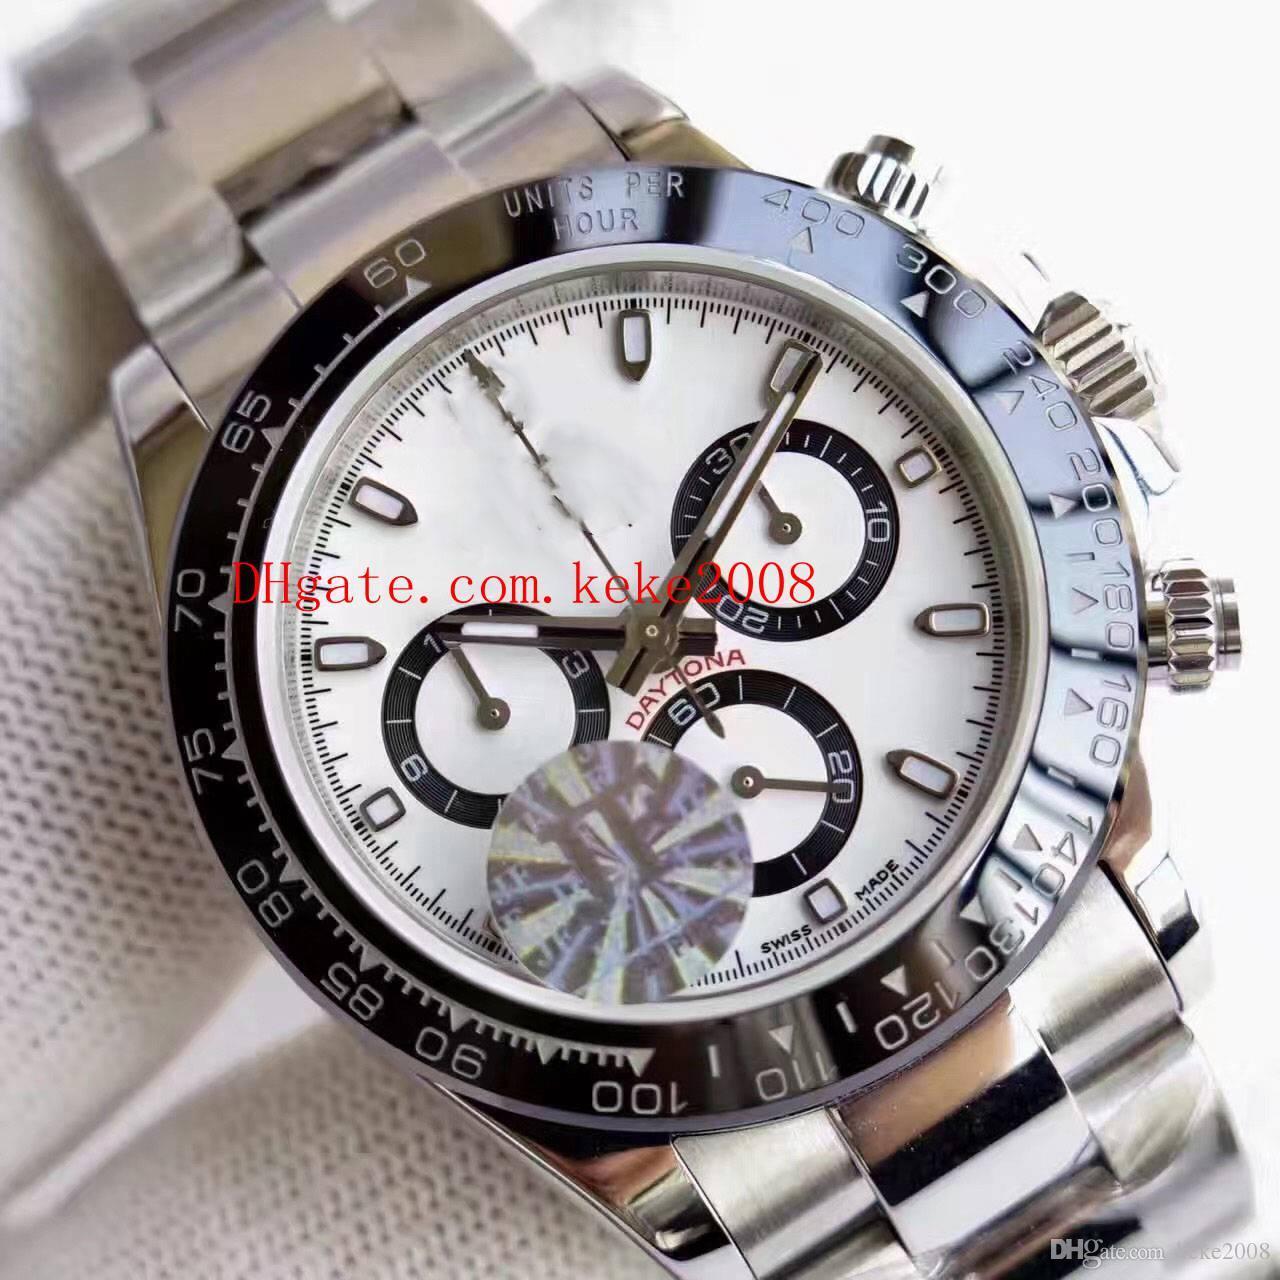 Best Edition наручные часы V2 версия J завод Cosmograph 116506 116520 116509 116500 40 мм ETA Механизм хронограф Мужские часы Наручные часы